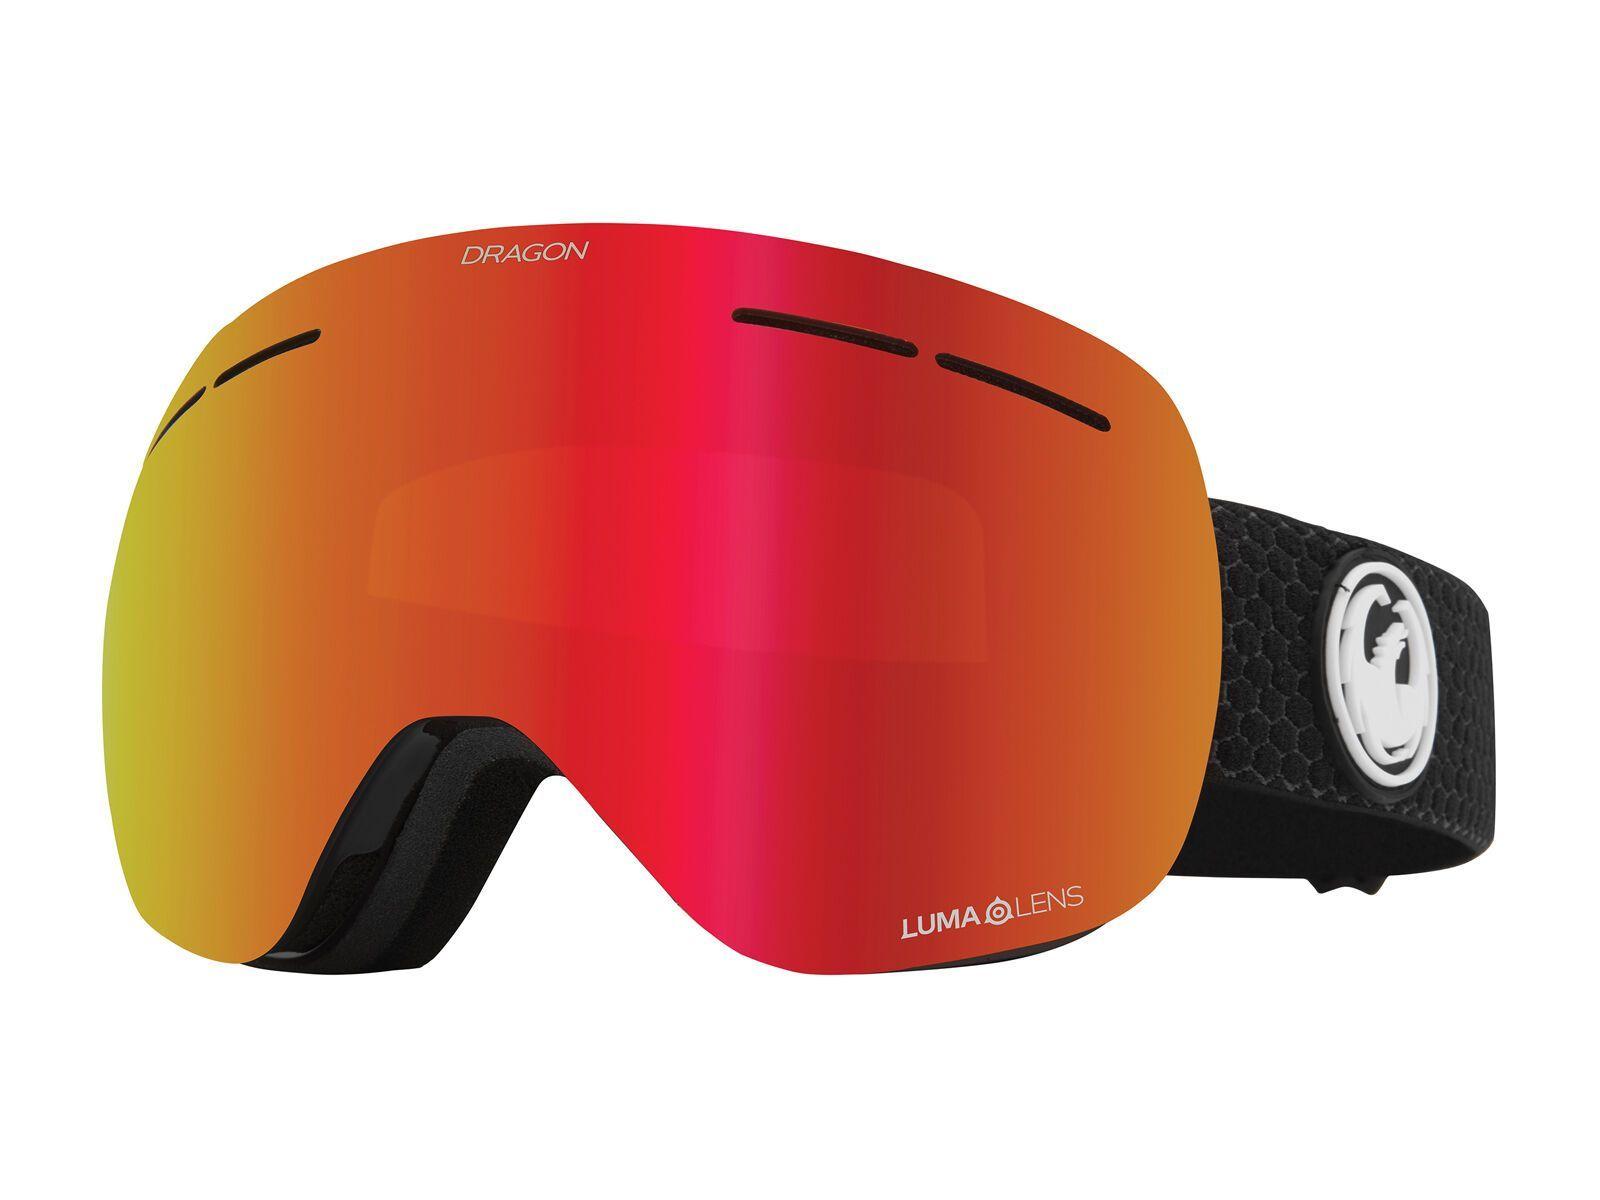 Dragon X1s inkl. WS, split/Lens: lumalens red ion - Skibrille 404607018614